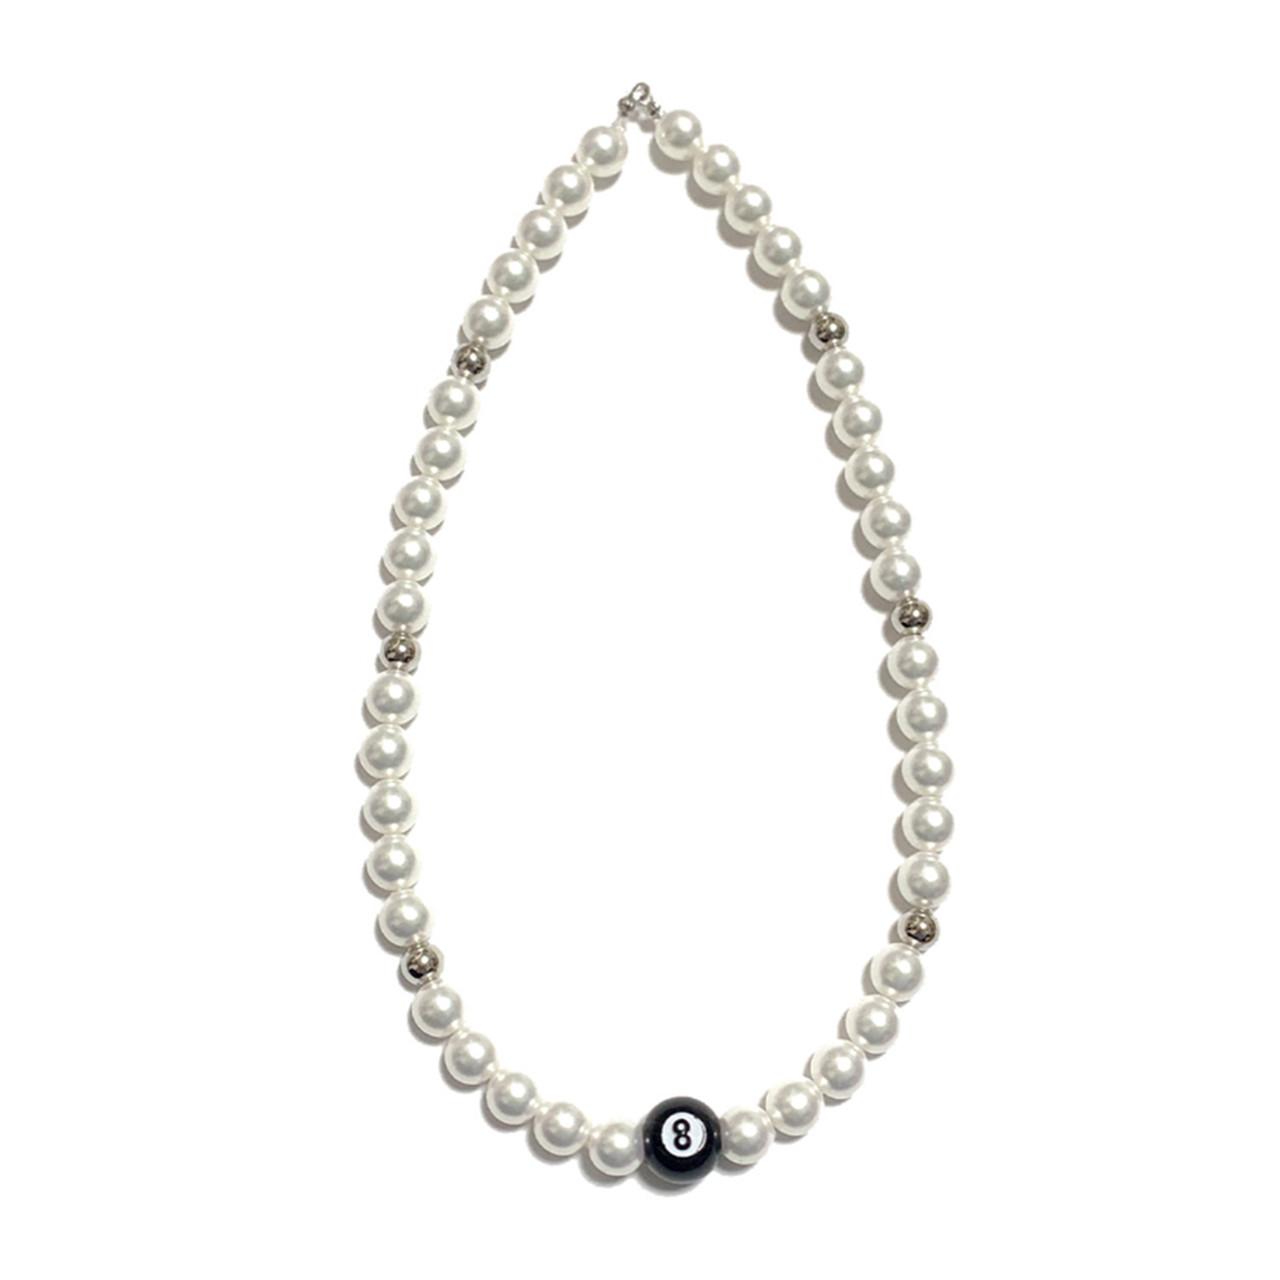 【Cat & Parfum】Eight Ball & Silver Beads Necklace